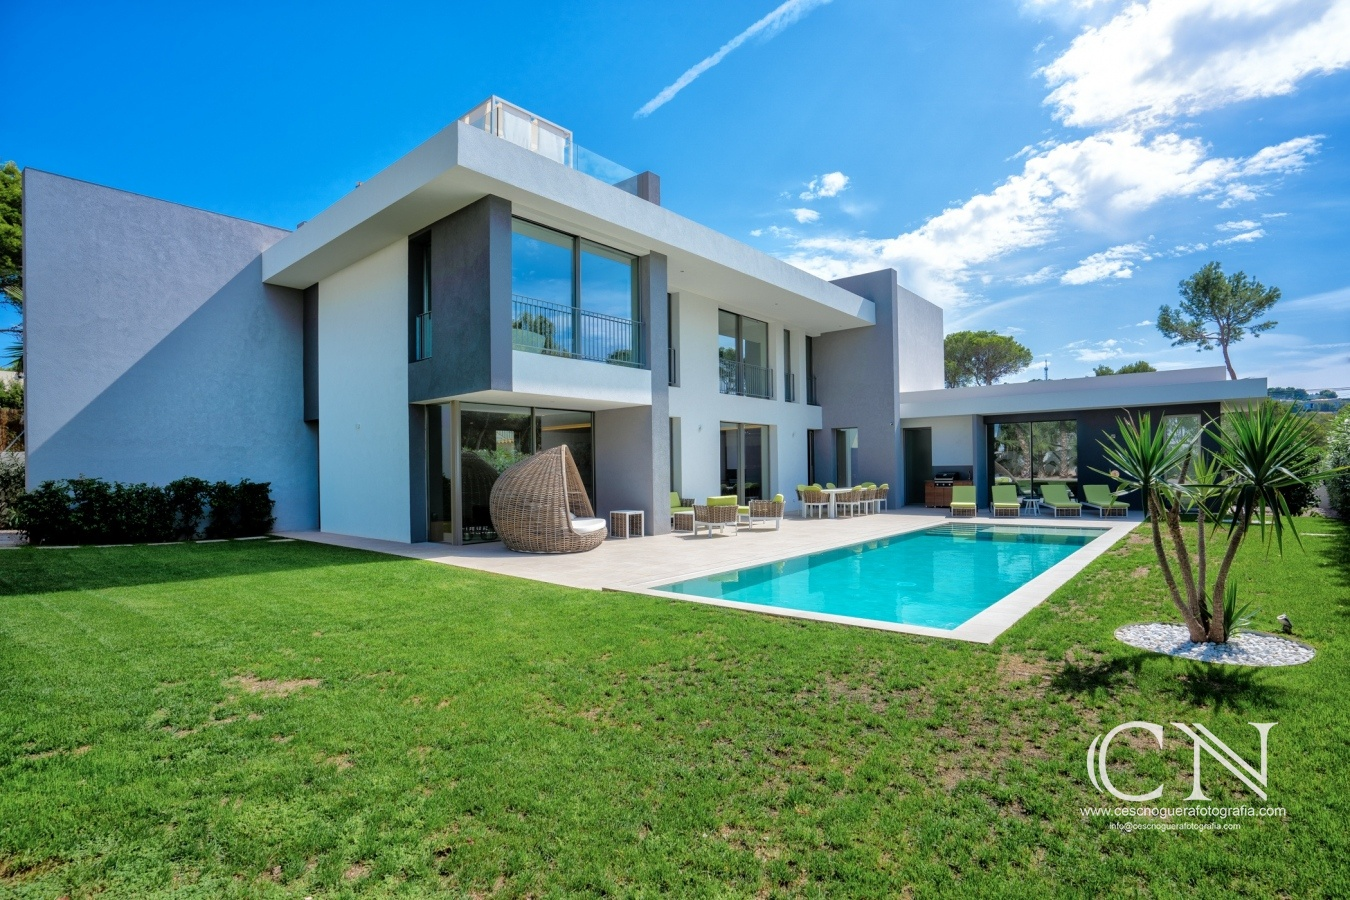 Villa moderna  Santa Ponça - Cesc Noguera Fotografia,  Architectural & Interior design photographer / Landscape Photography.